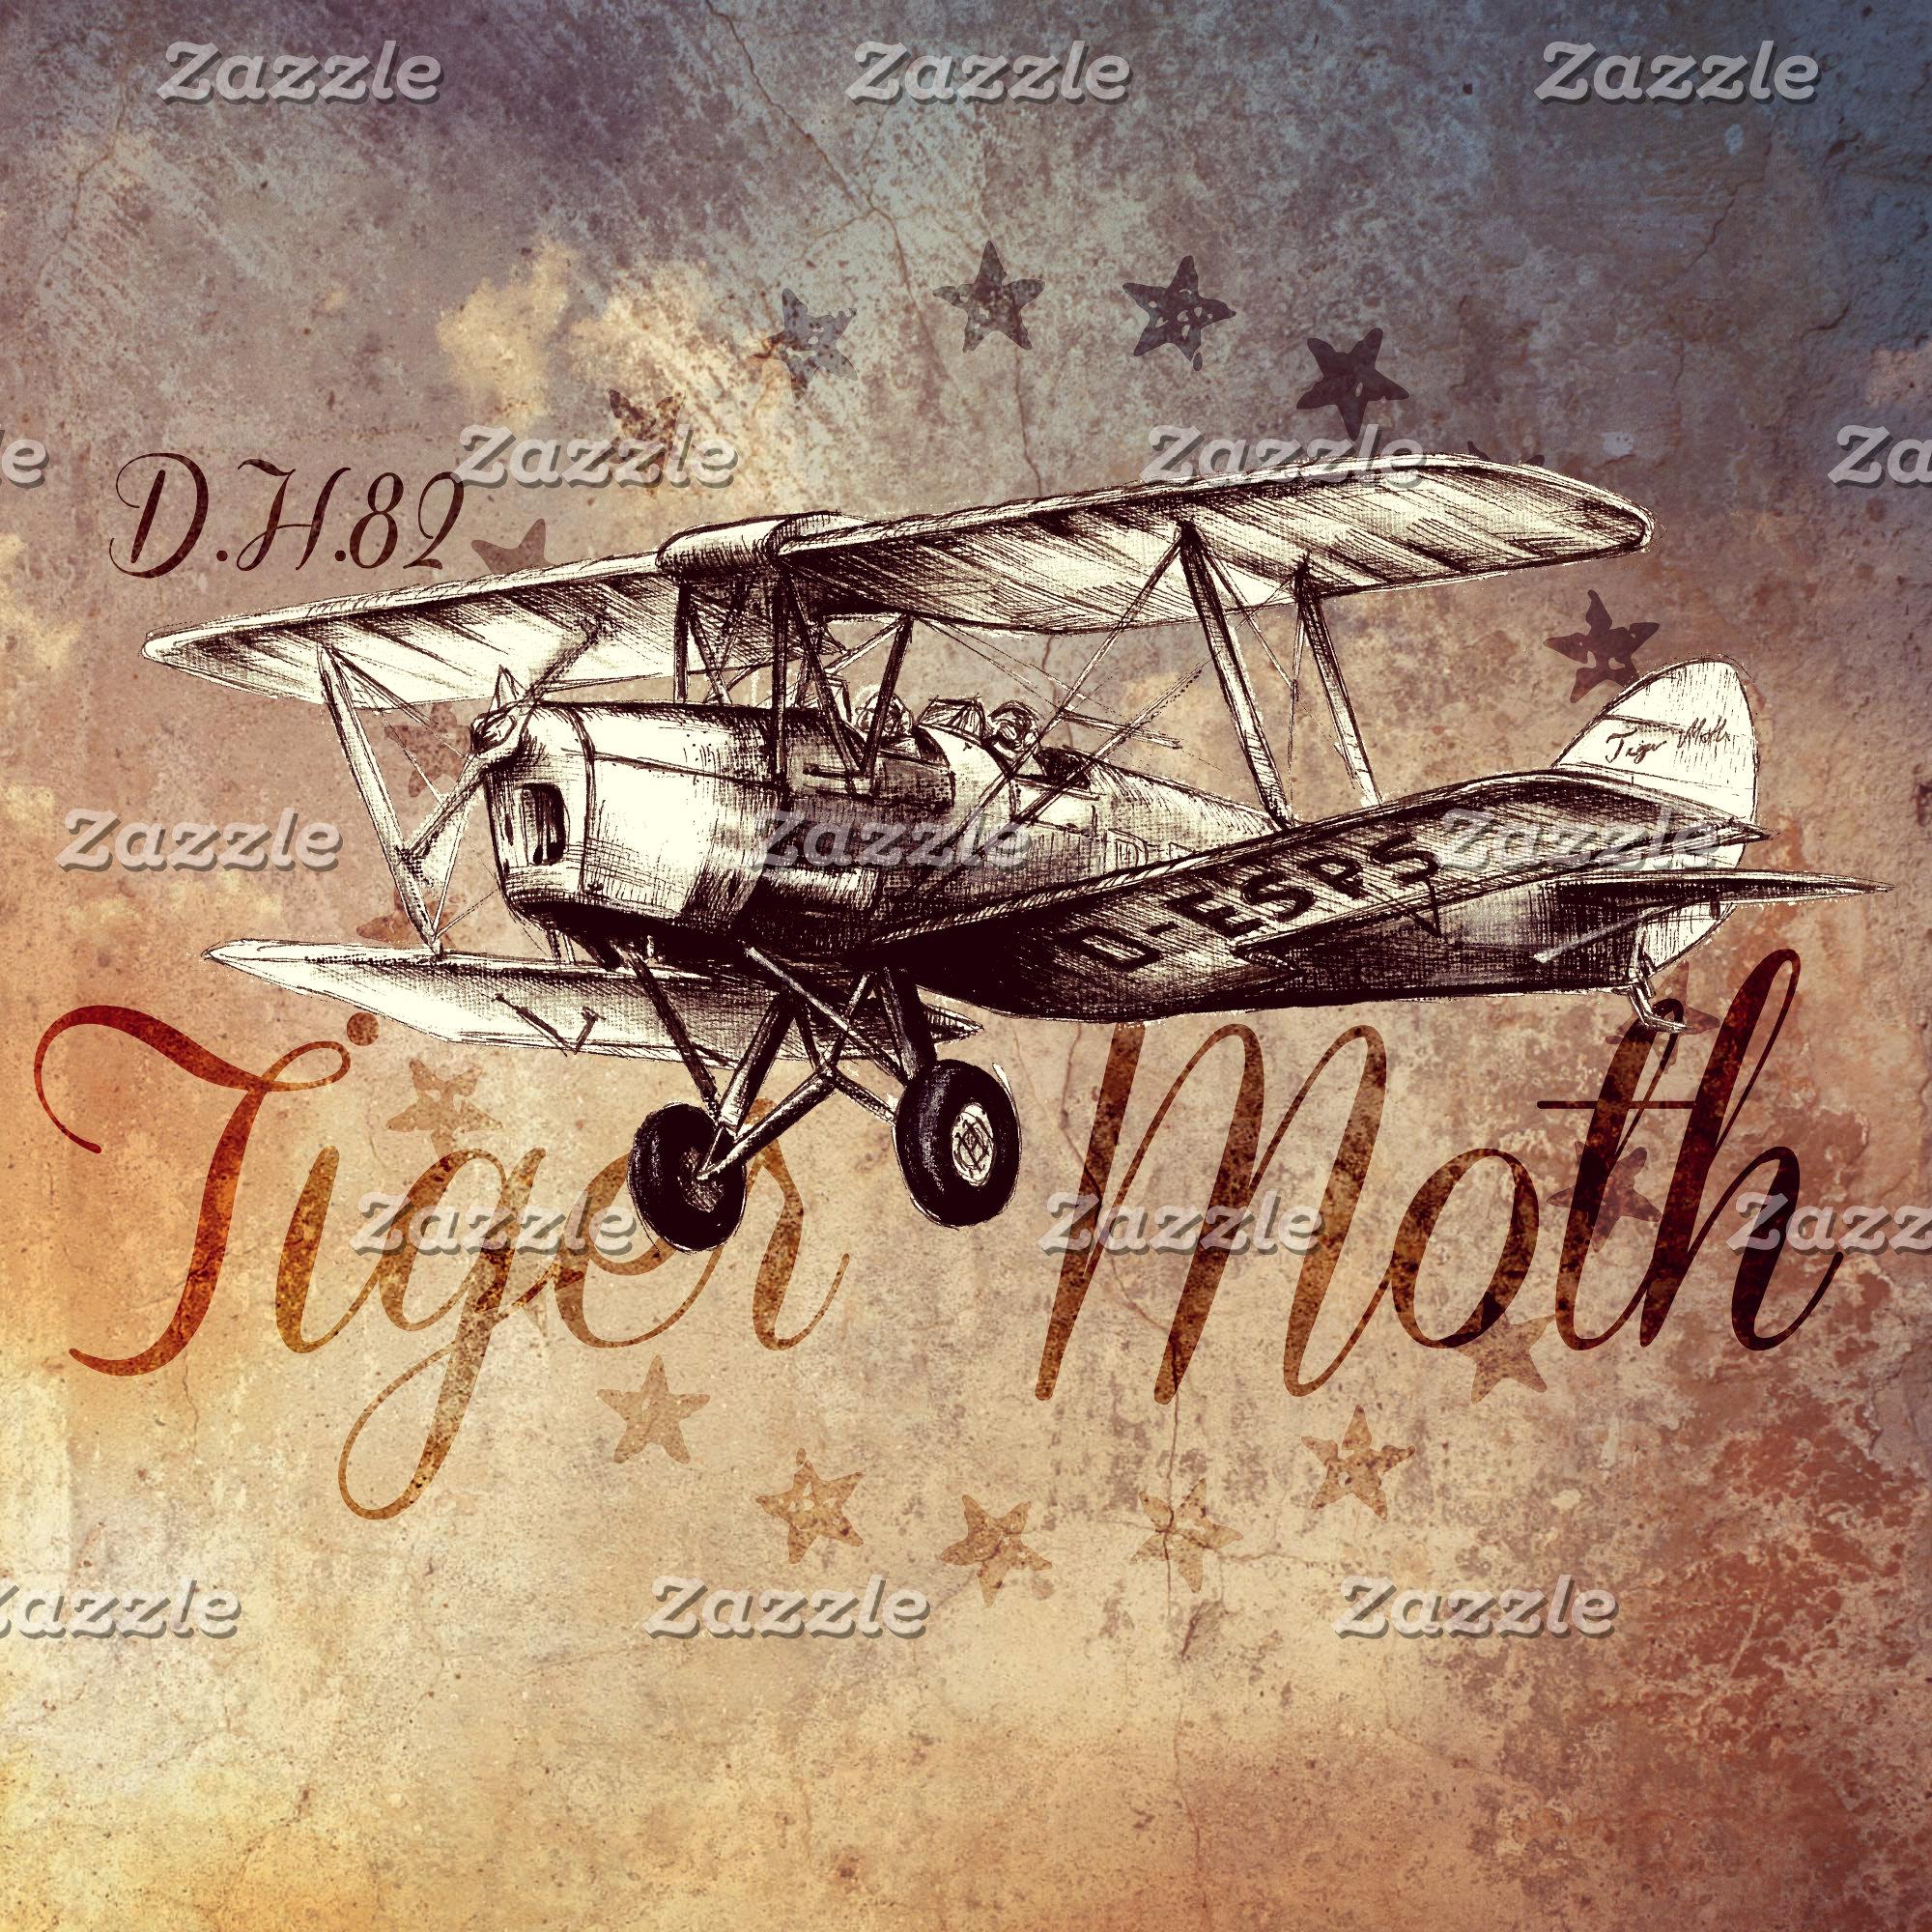 DH.82 Tiger Moth Vintage Biplane